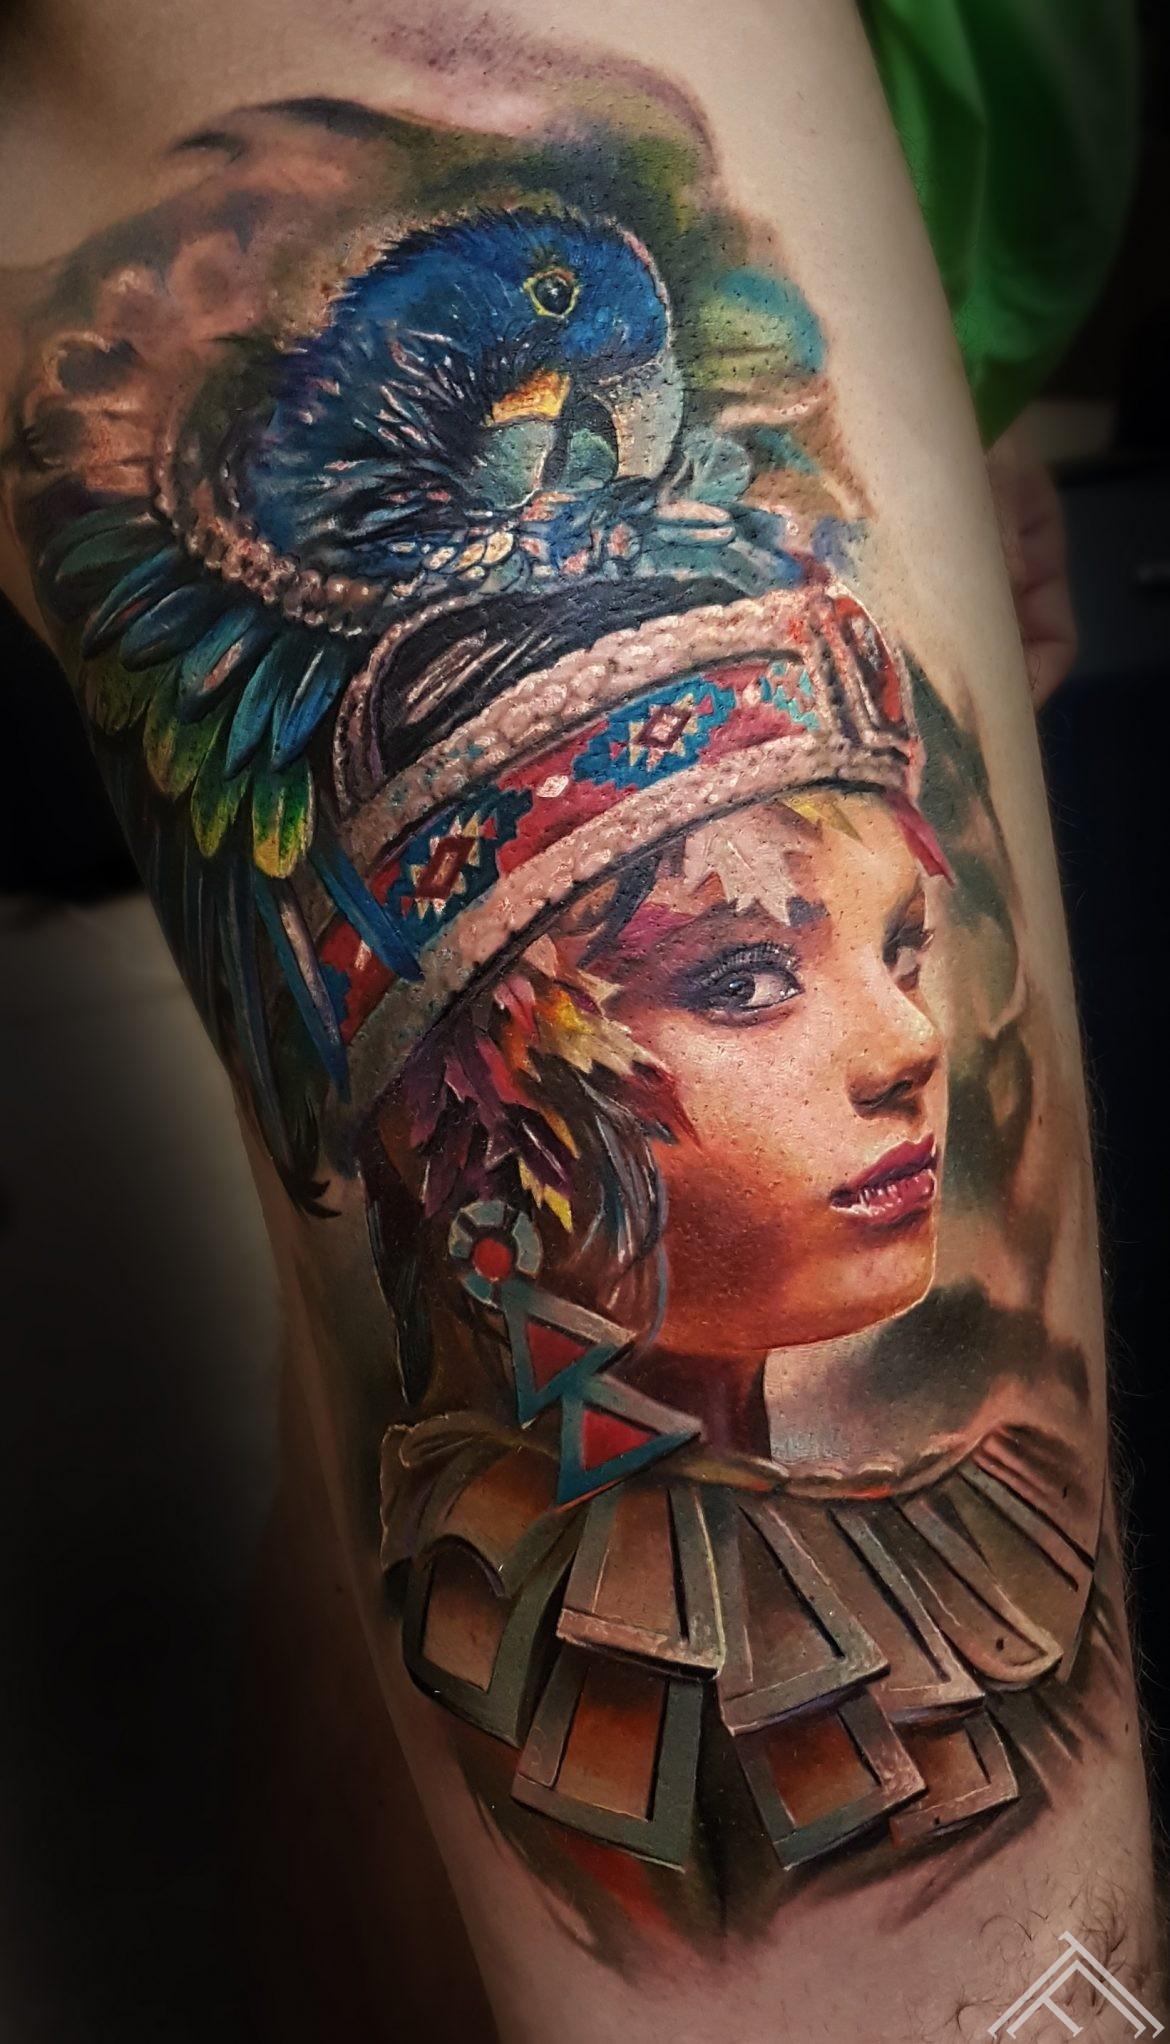 raimundo-pagaidu-tattoo-tattoofrequency-marispavlo